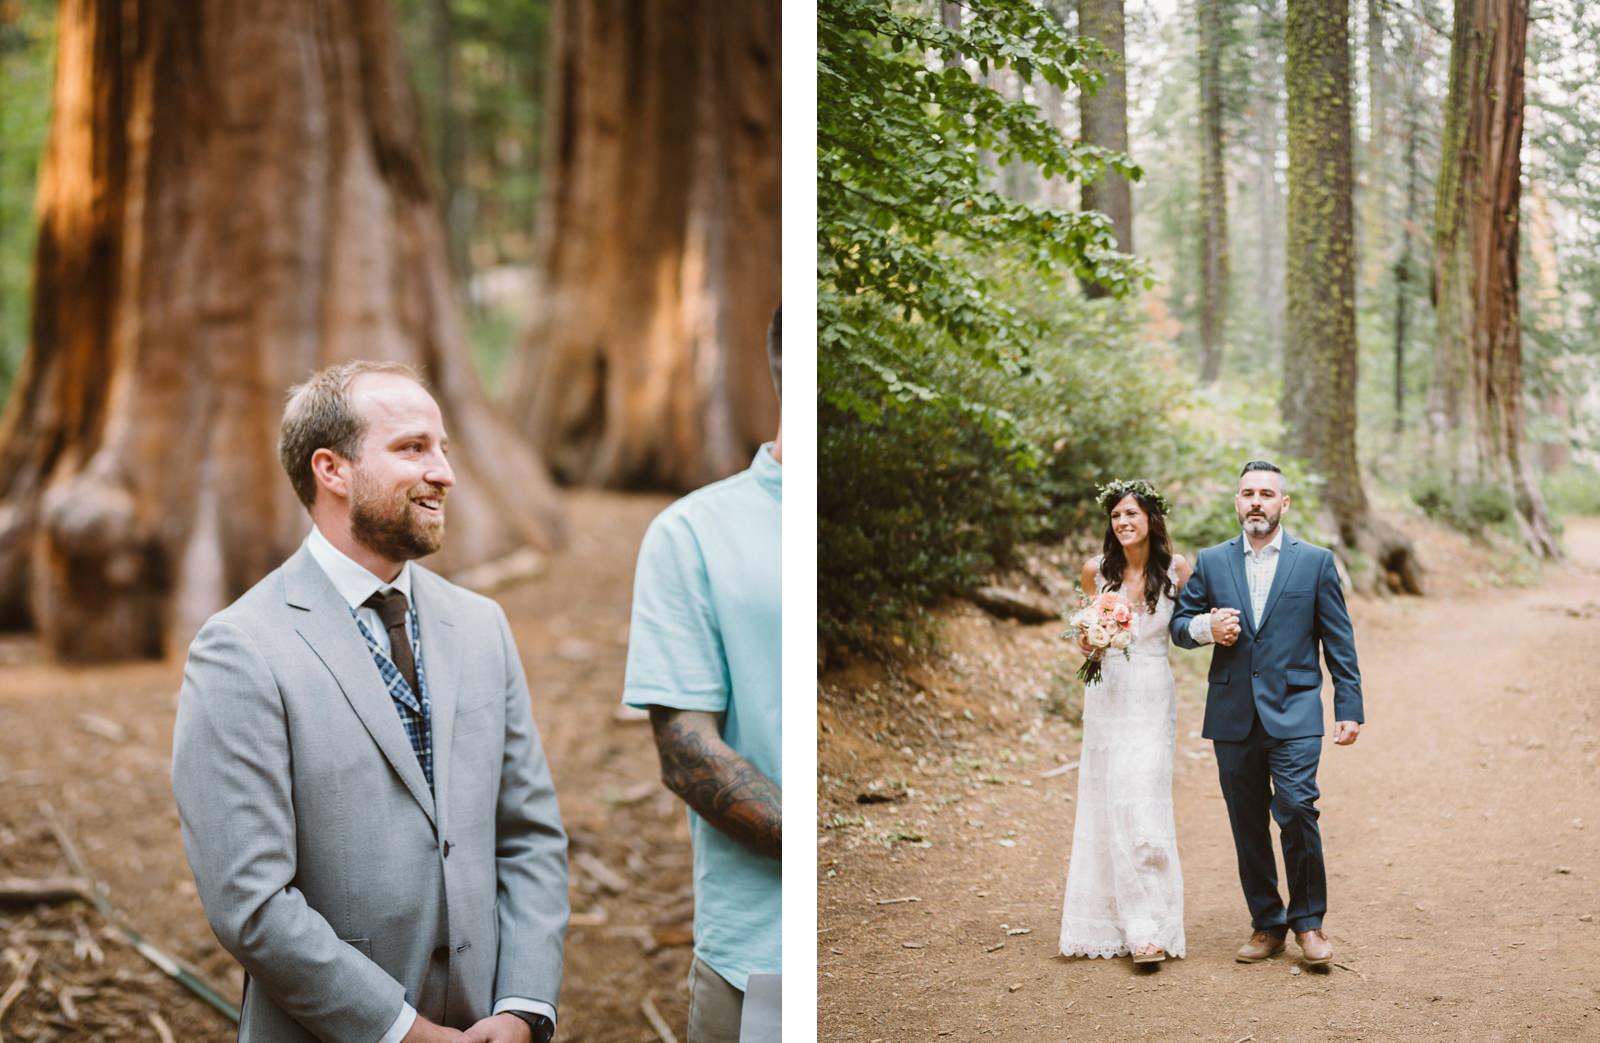 yosemite-intimate-wedding-041 YOSEMITE INTIMATE WEDDING